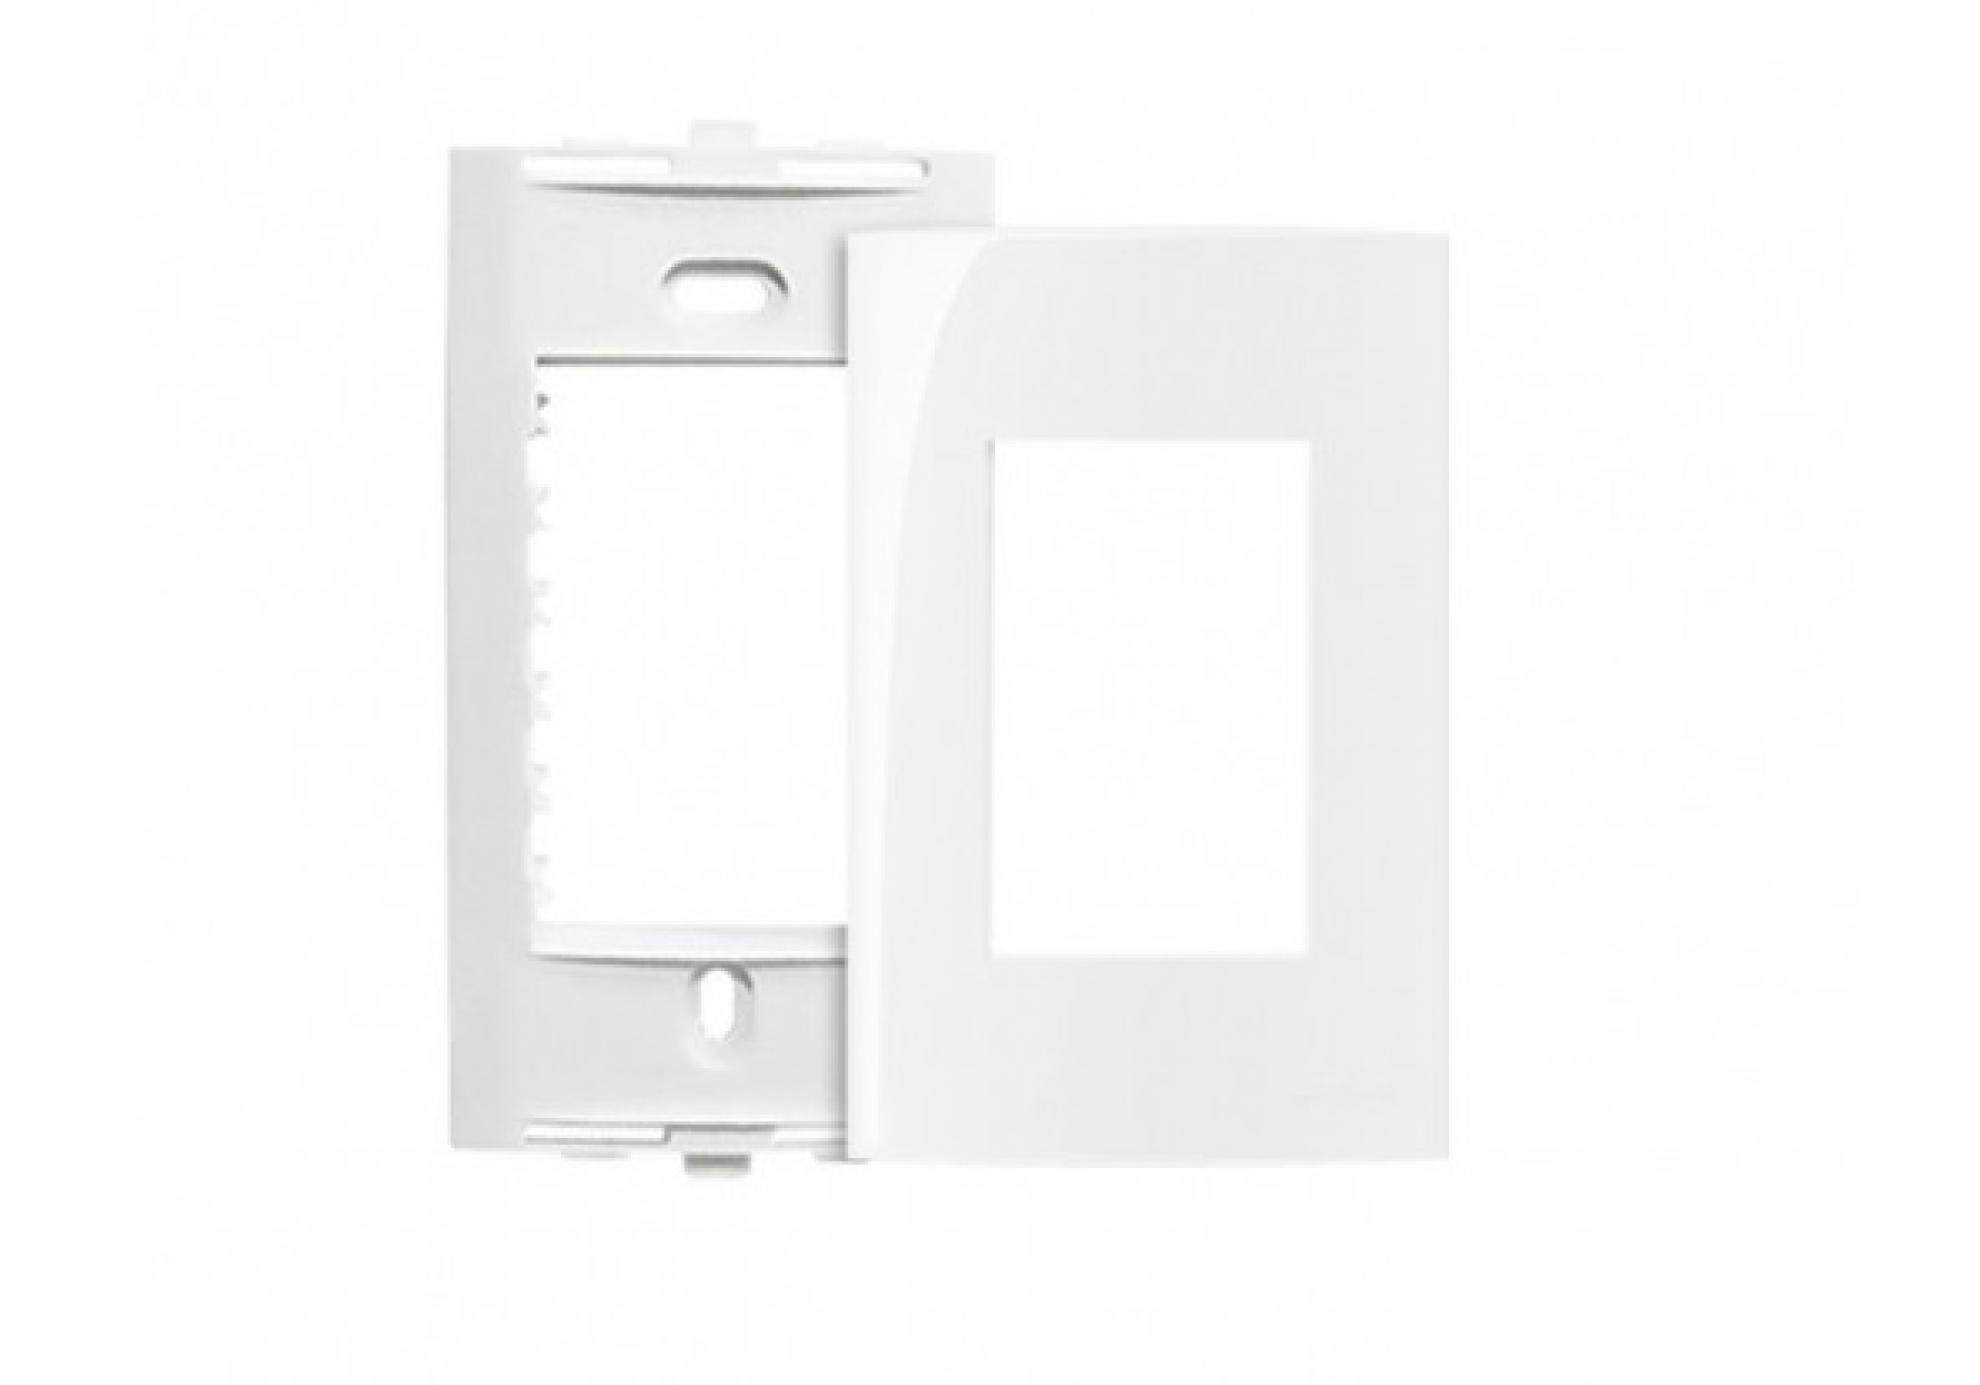 Placa 4X2 3Postos + Suporte - Branco